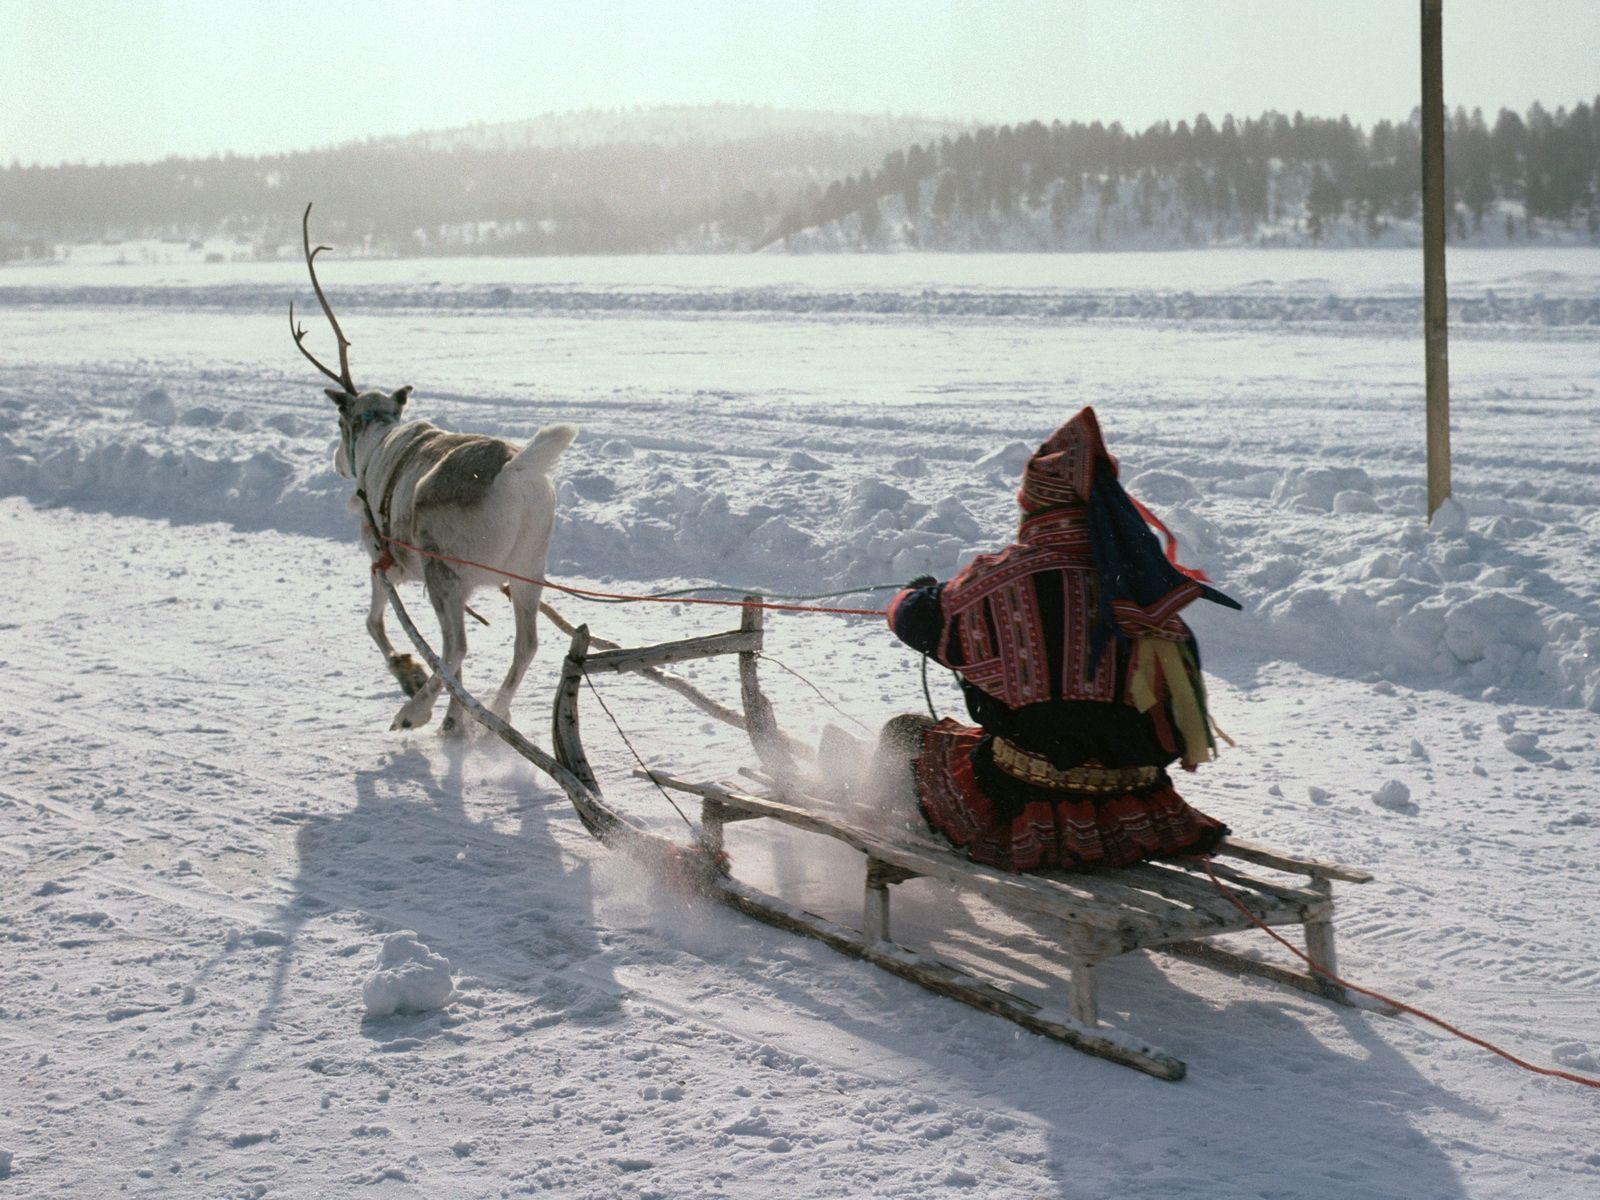 125589 descargar fondo de pantalla Naturaleza, Polo Norte, Esquimal, Trineo, Ciervo, Transporte, Nieve: protectores de pantalla e imágenes gratis